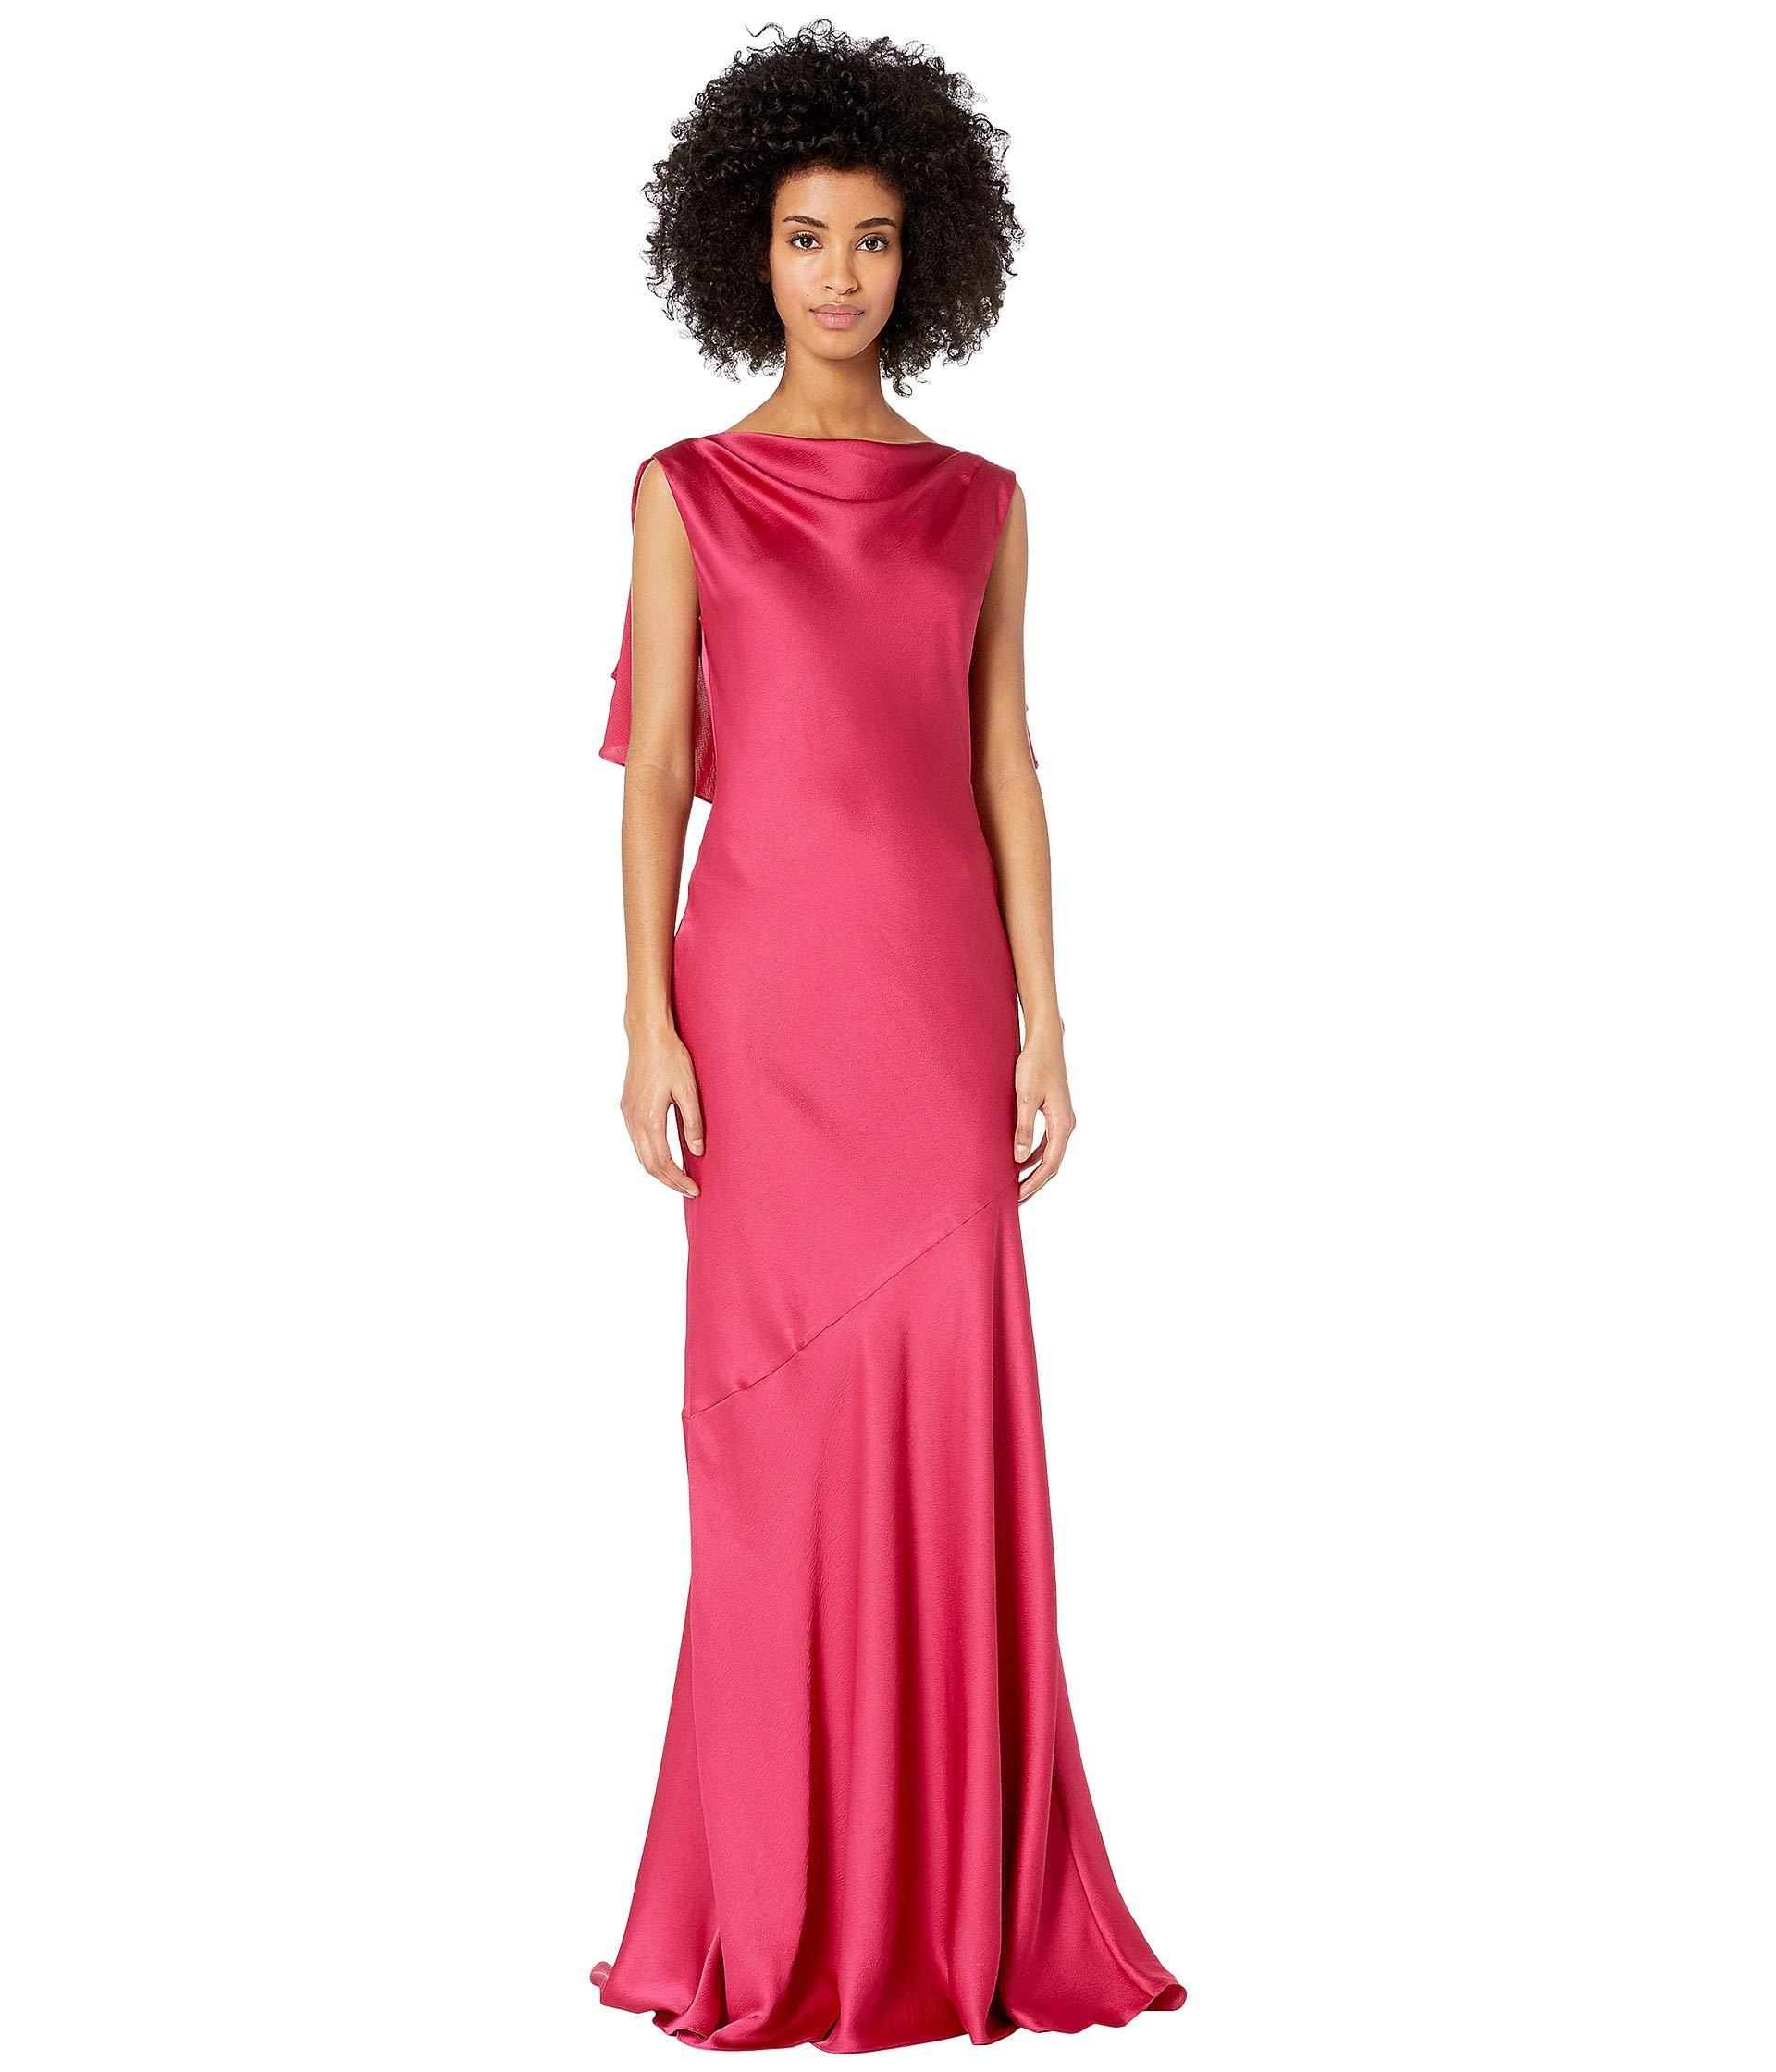 ca4e2778a80 Rachel Zoe Ami Gown (royal fuchsia) Women s Dress - Lyst